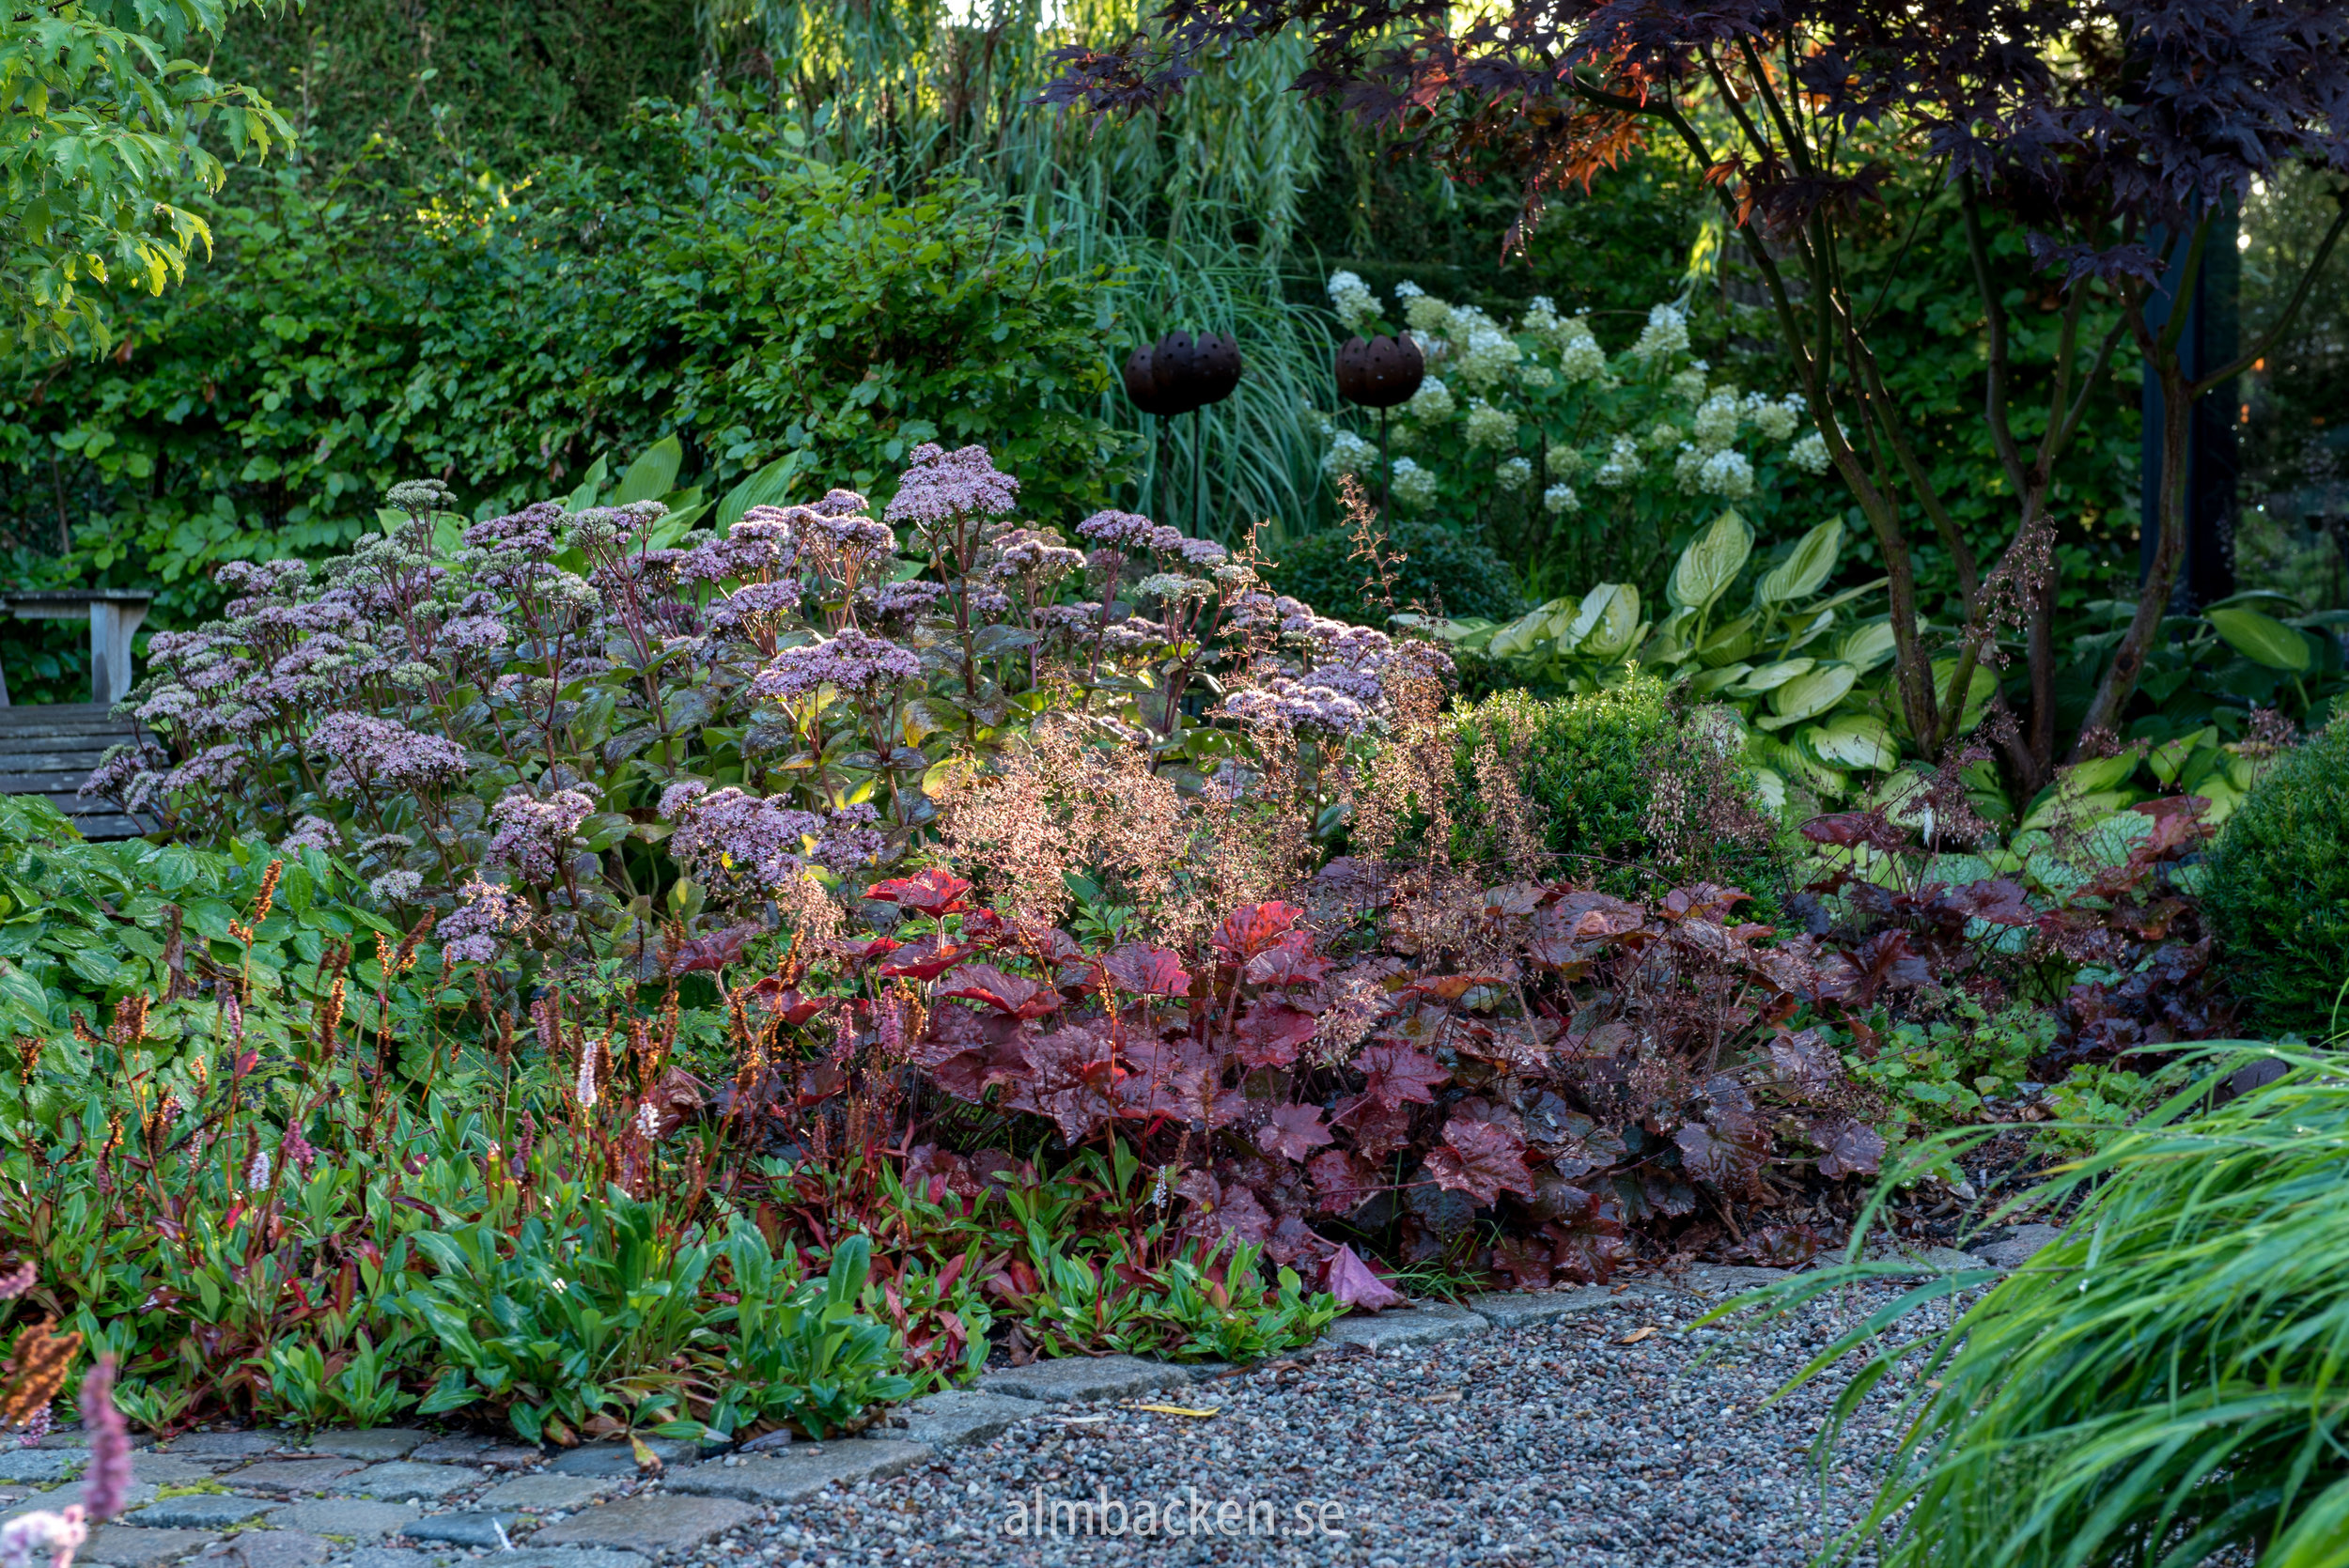 Bistorta affinis 'Darjeeling red', Heuchera Palace Purple' and Hylotelphium telephium 'Matrona'